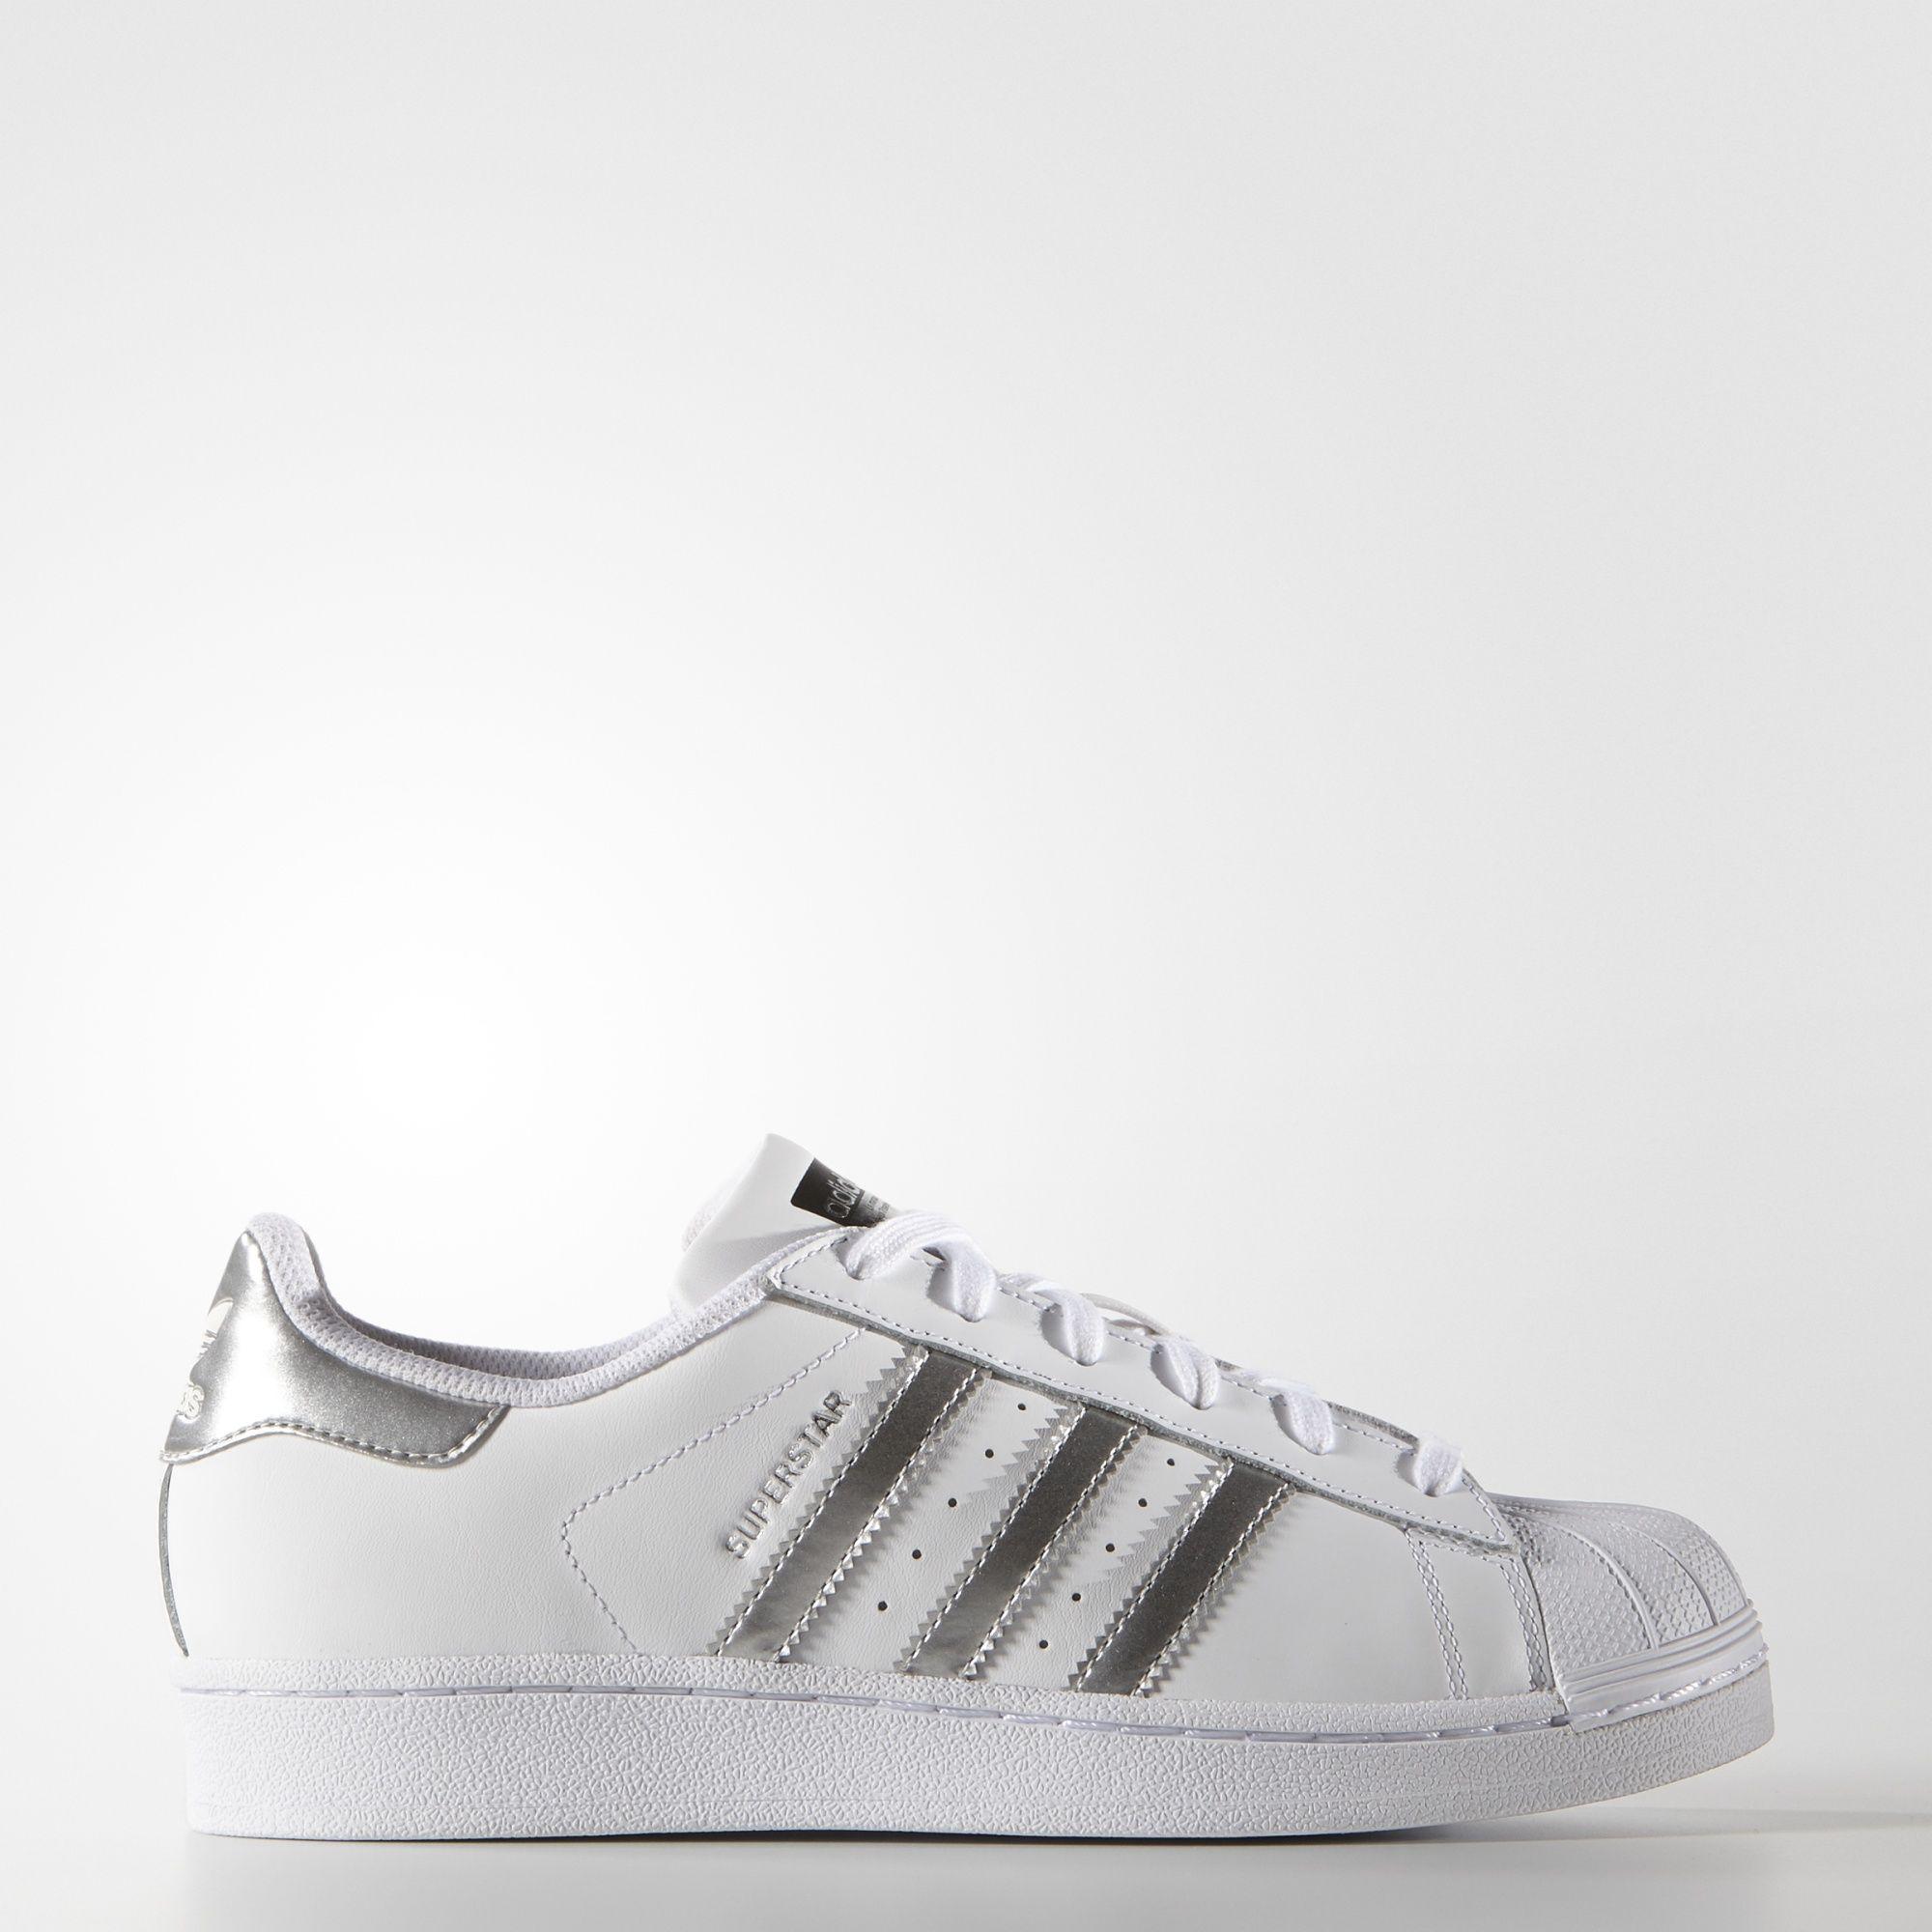 20421ef3e9f Sneakers AQ3091 Zapatillas Adidas Superstar Mujer